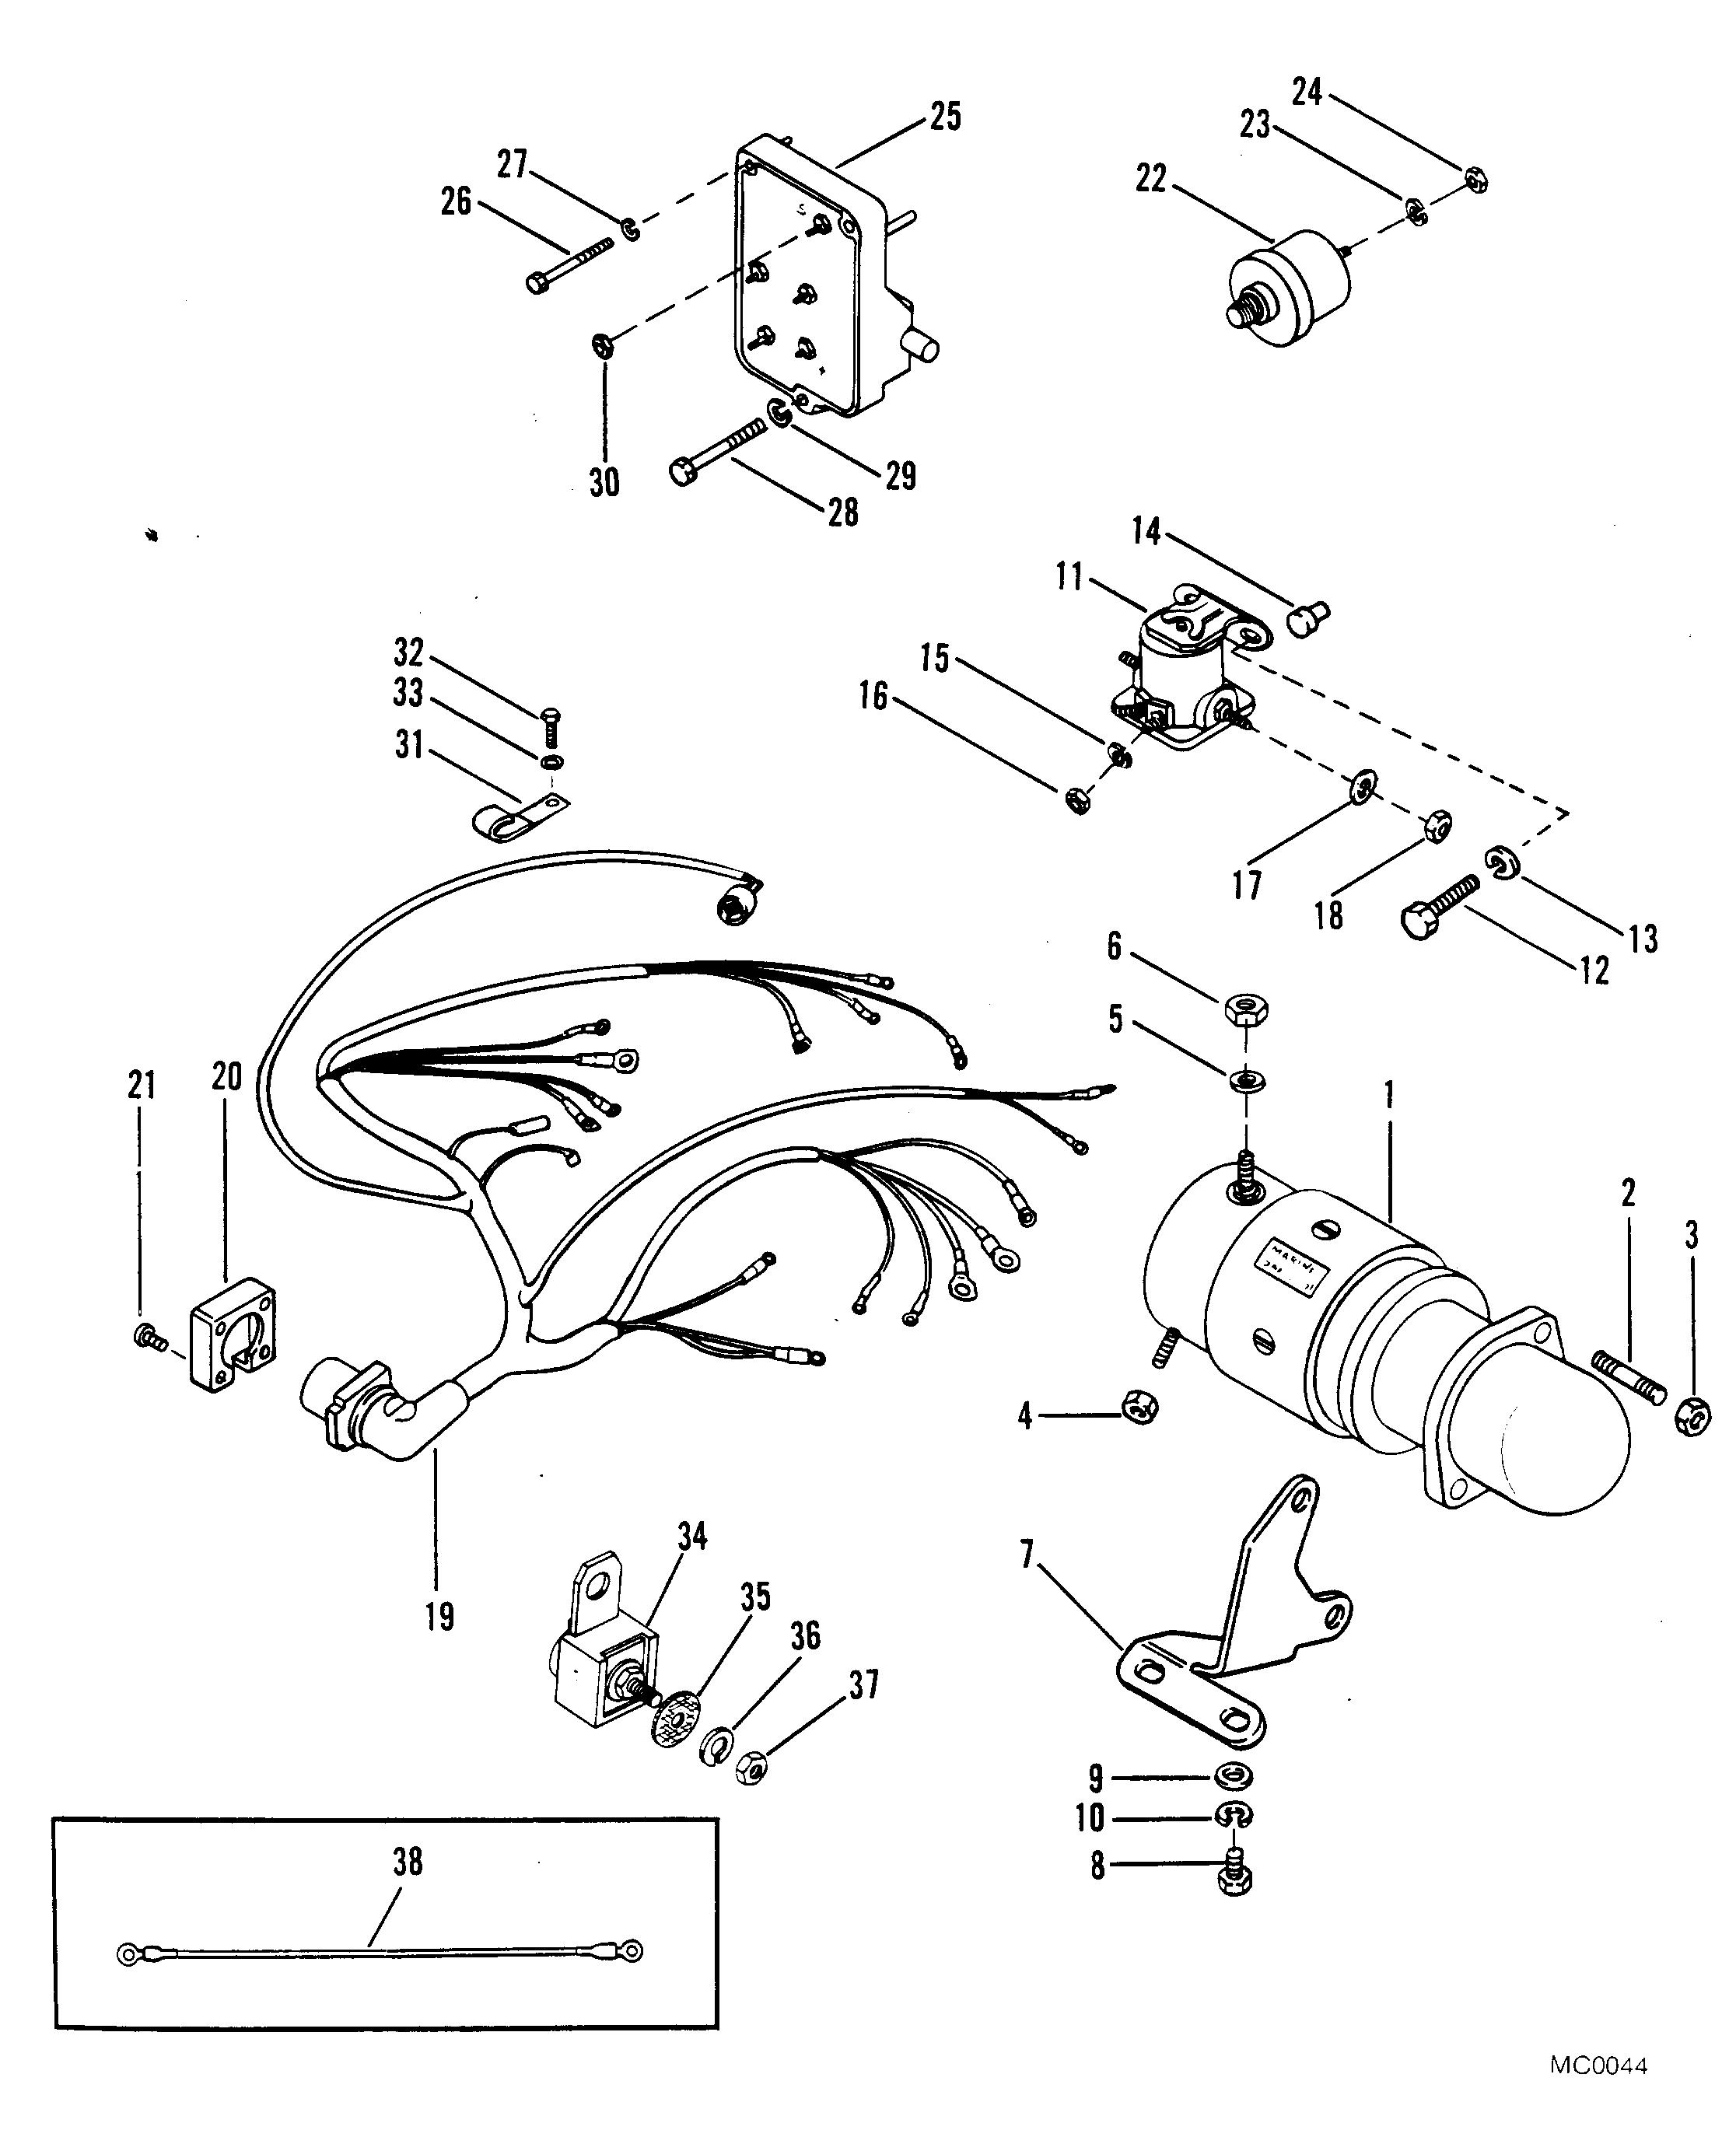 starter motor and wiring harness for mercruiser 488r engine